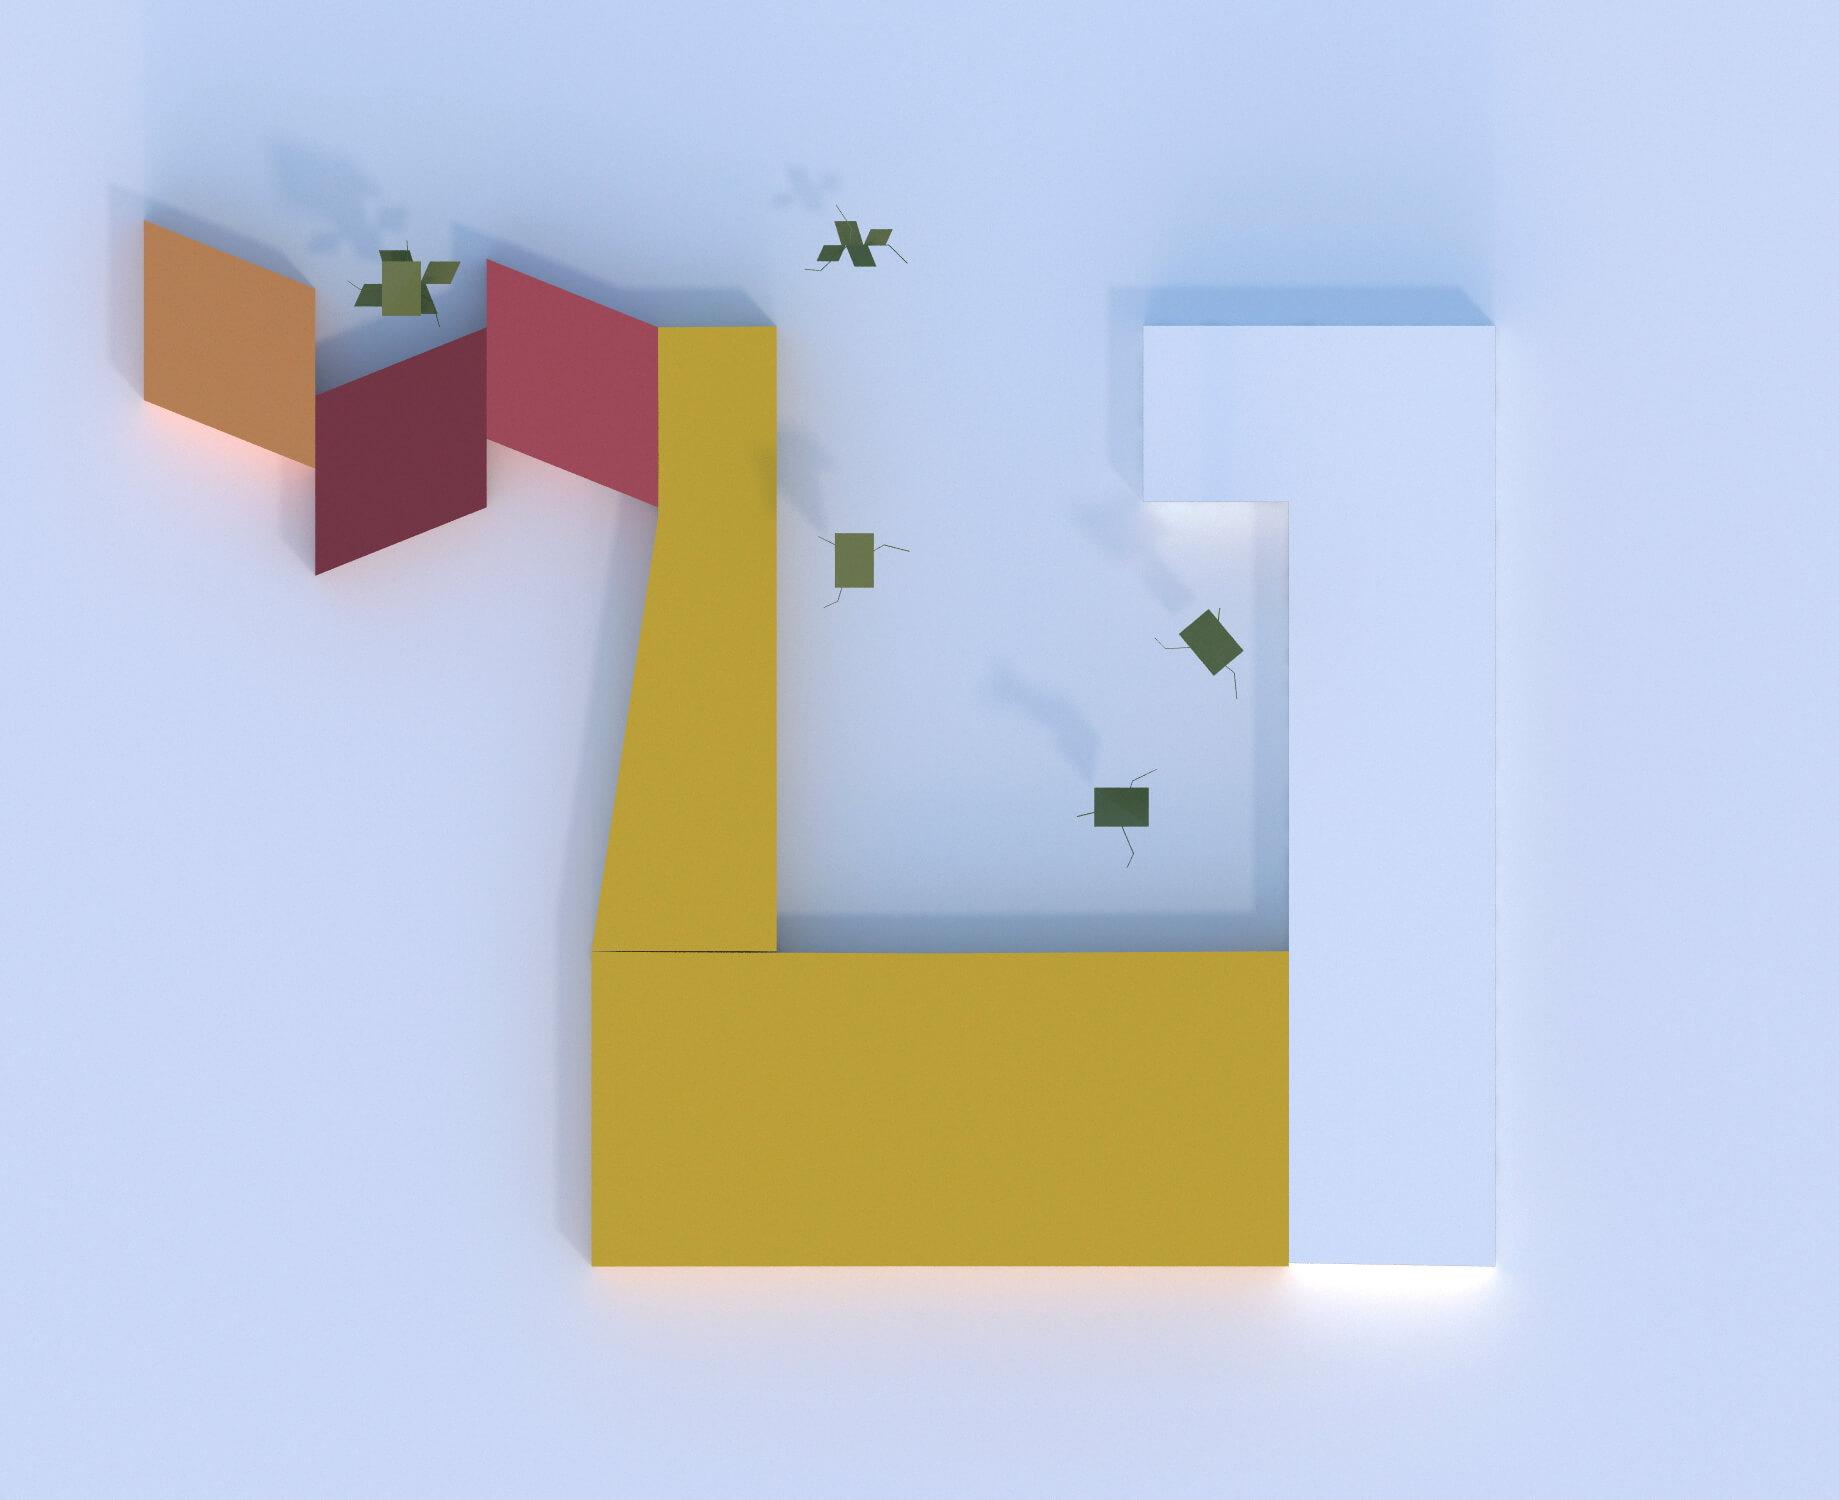 planell-hirsch_concurso_arquitectura_alemania 2